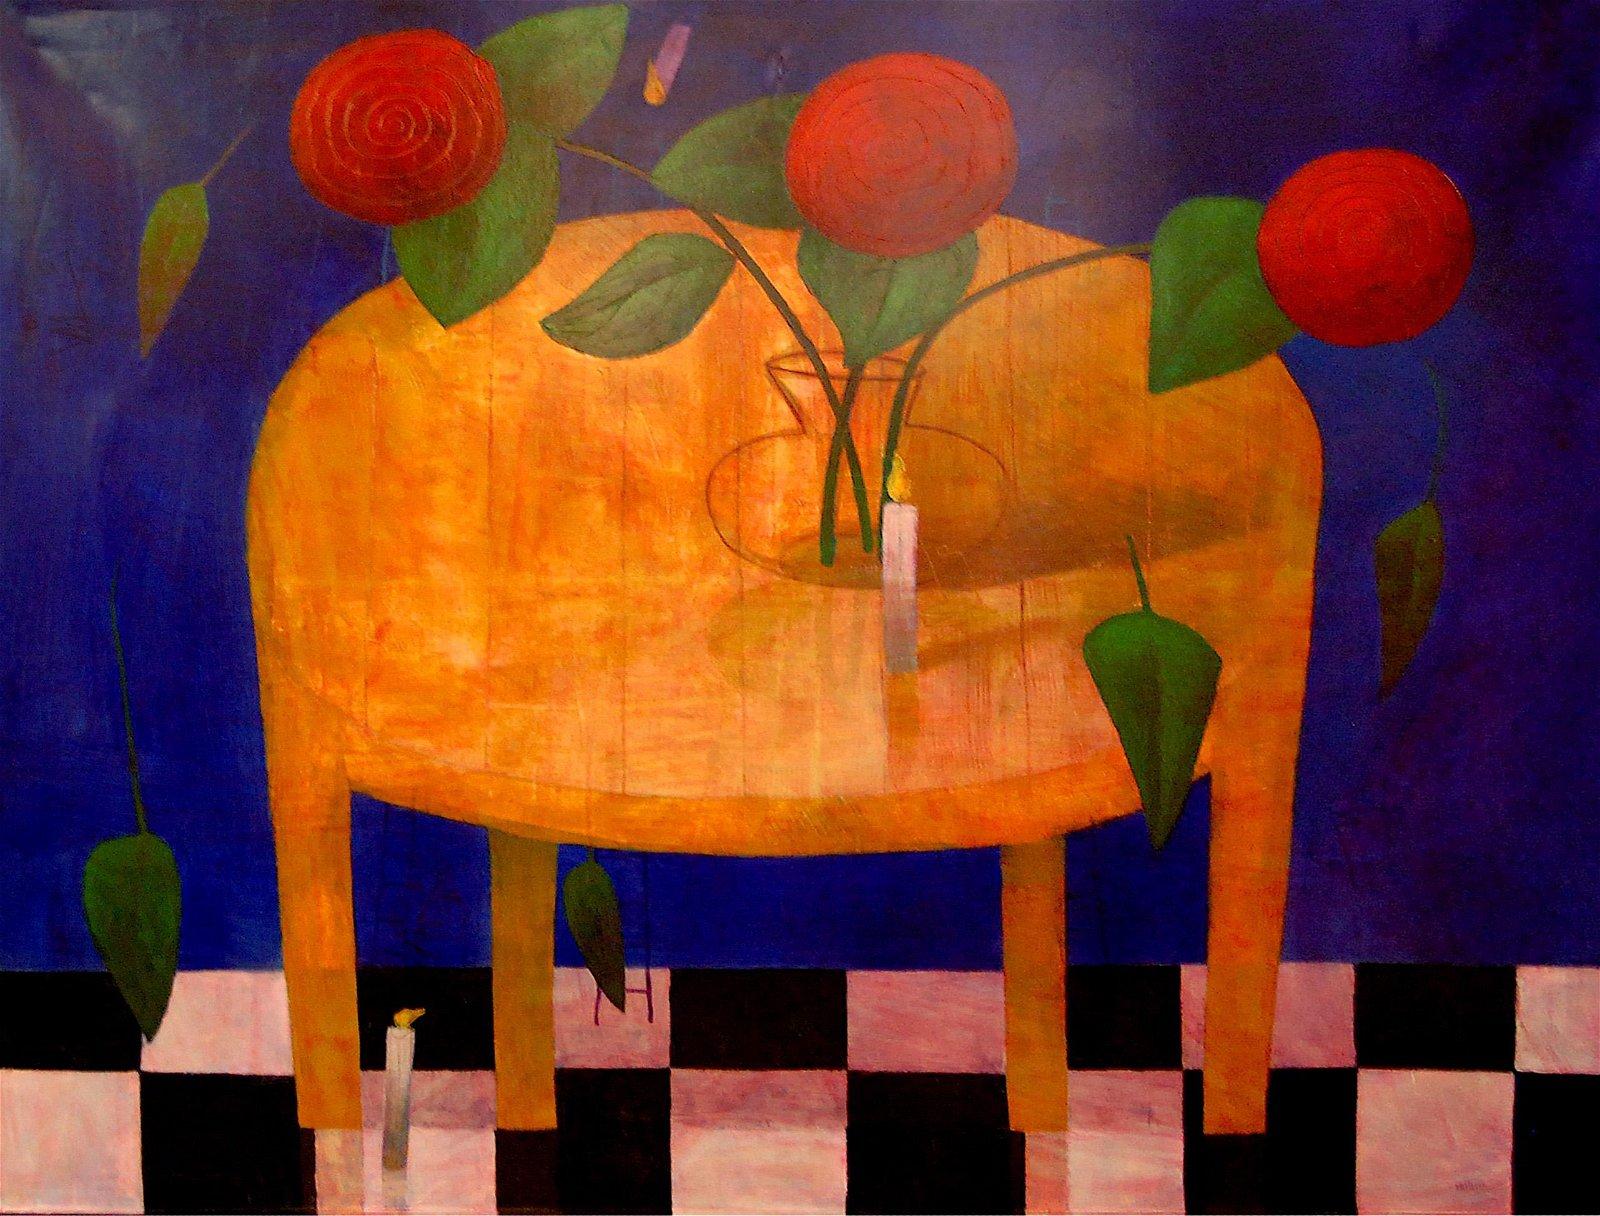 Jorge Vallejos (Peru 1965) - Flower Ritual II